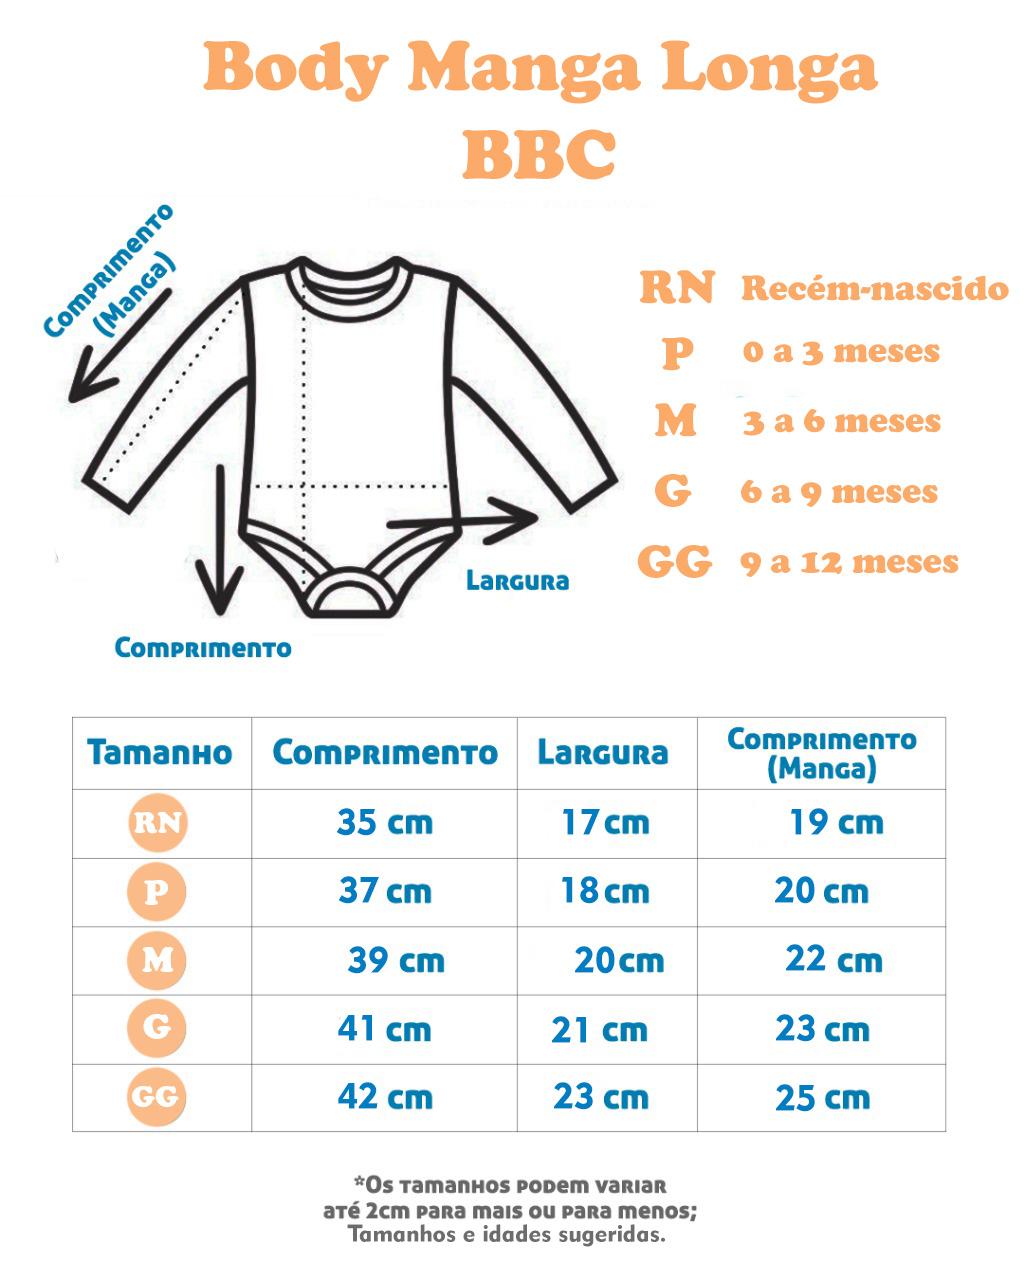 Body Manga Longa Monstrinhos Azul (RN/P/M/G/GG)